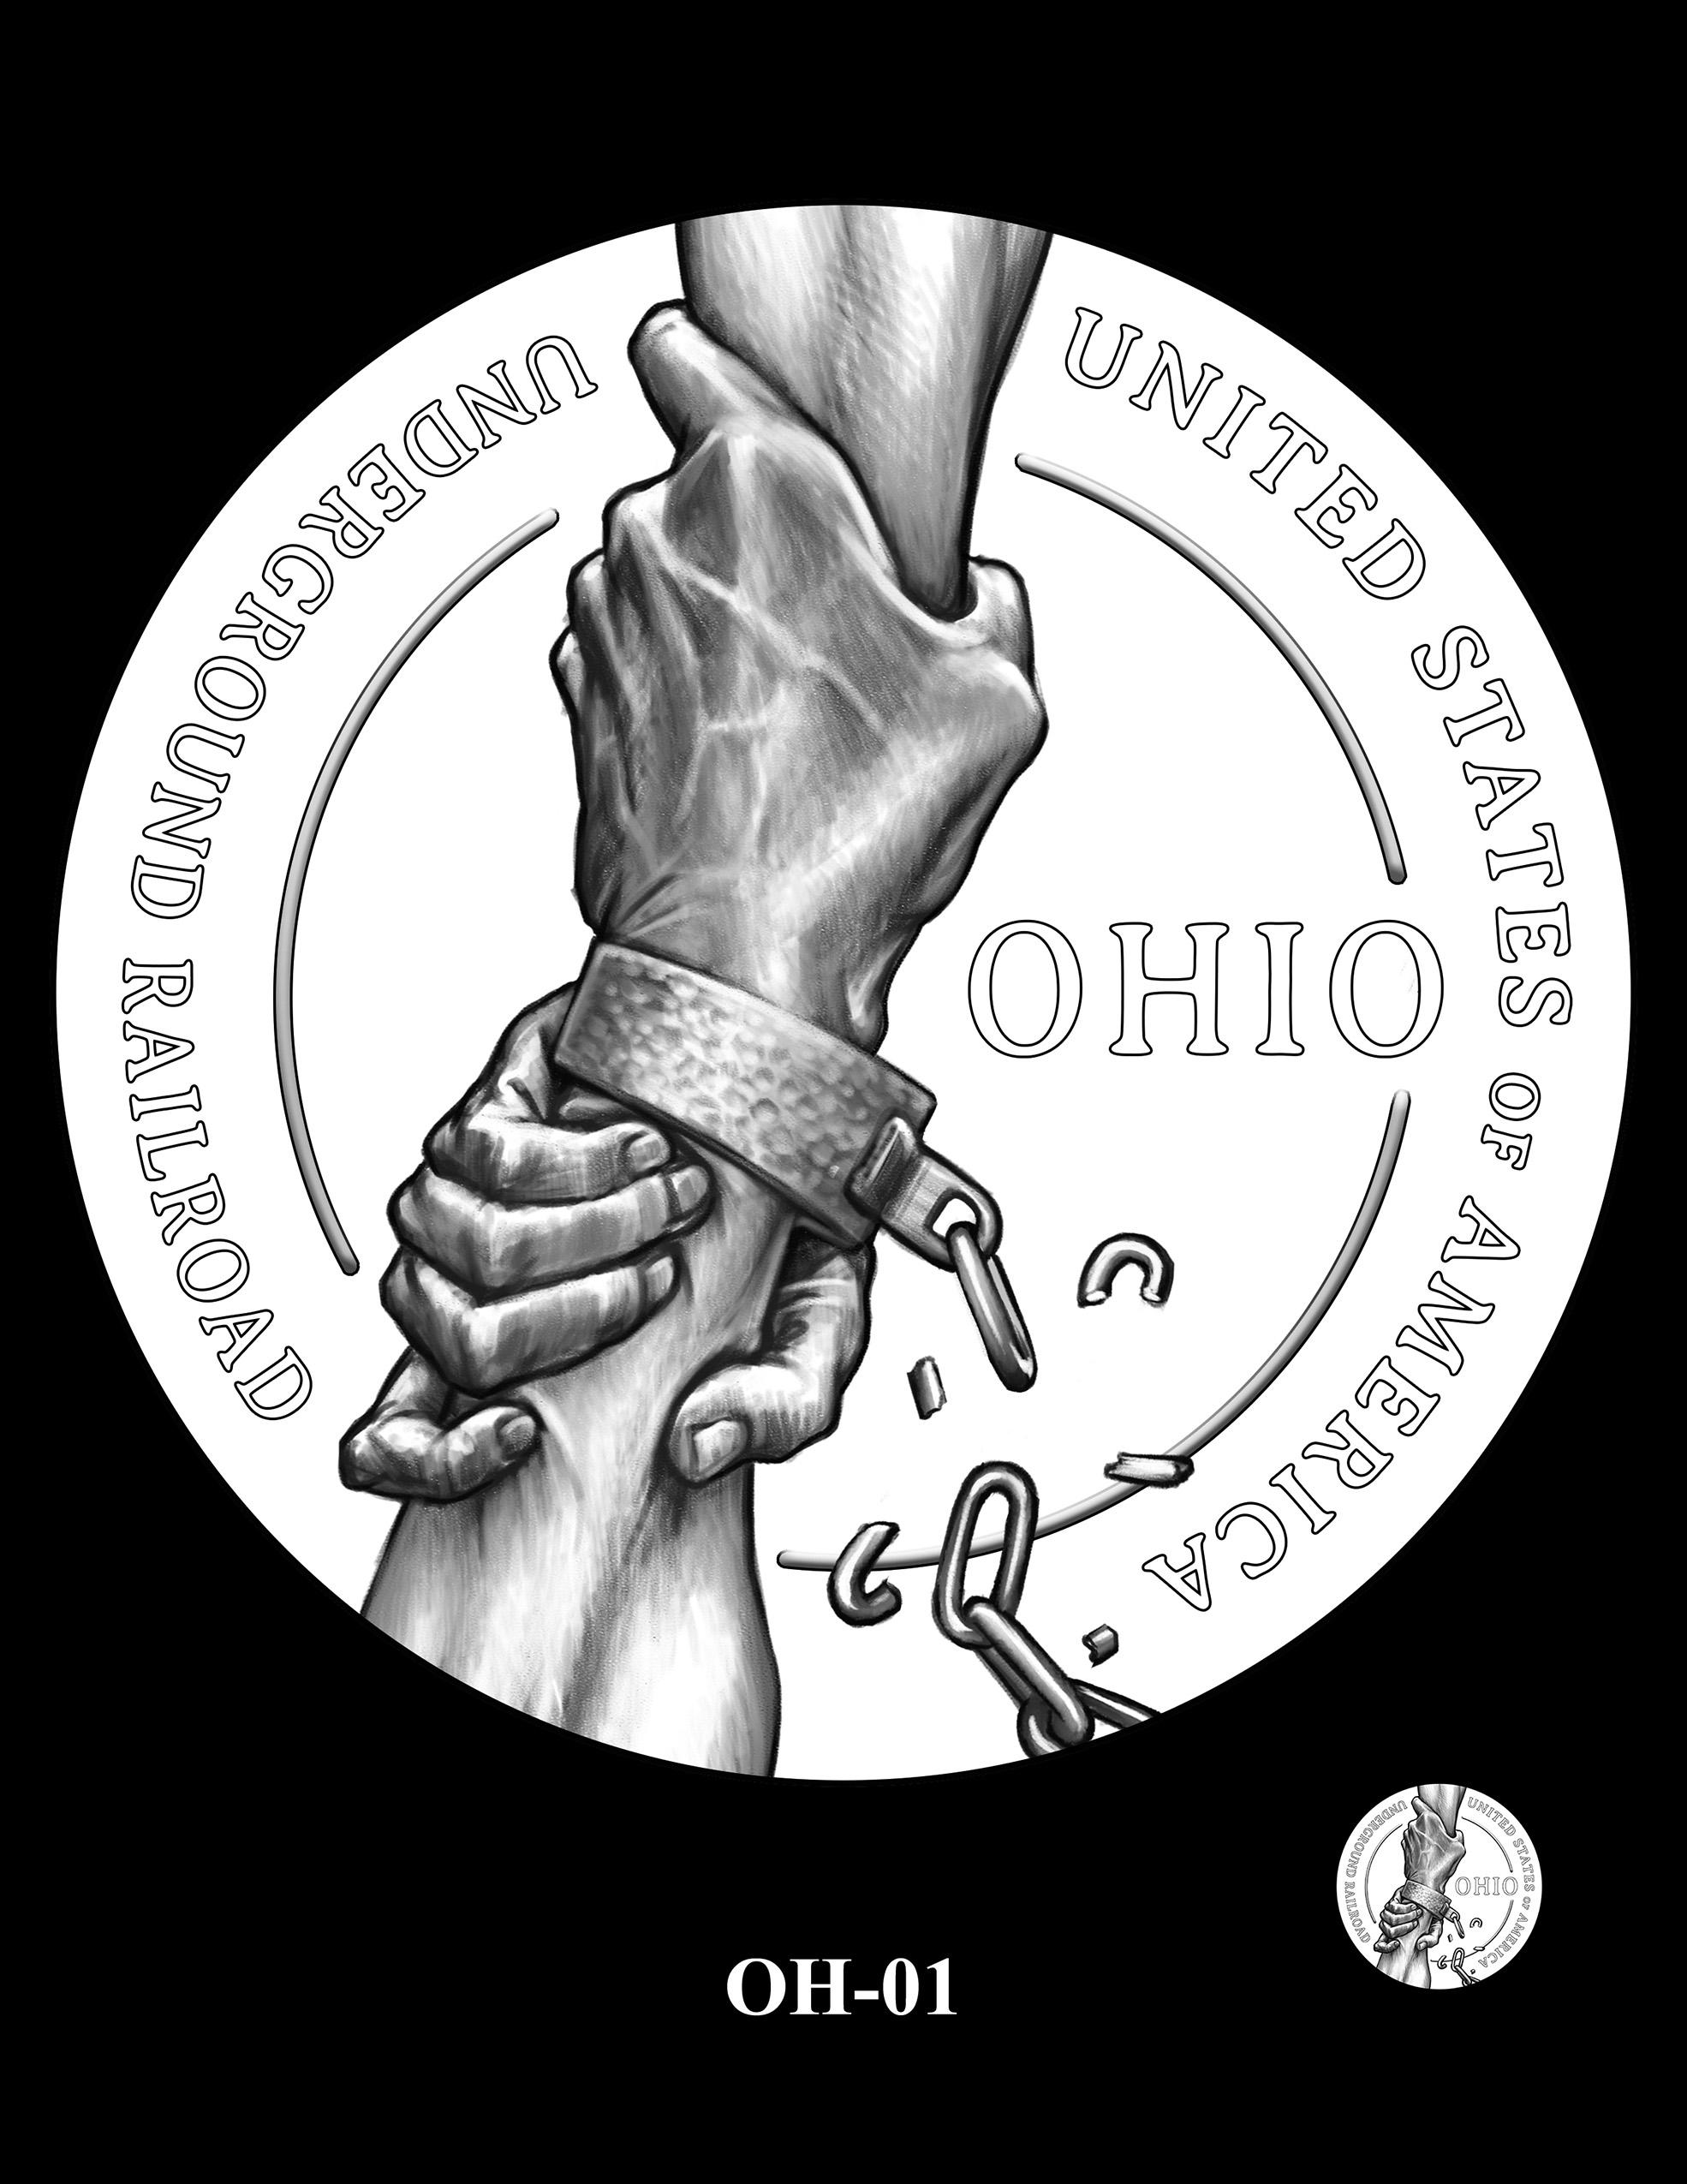 OH-01 -- 2023 American Innovation $1 Coin Program - Ohio